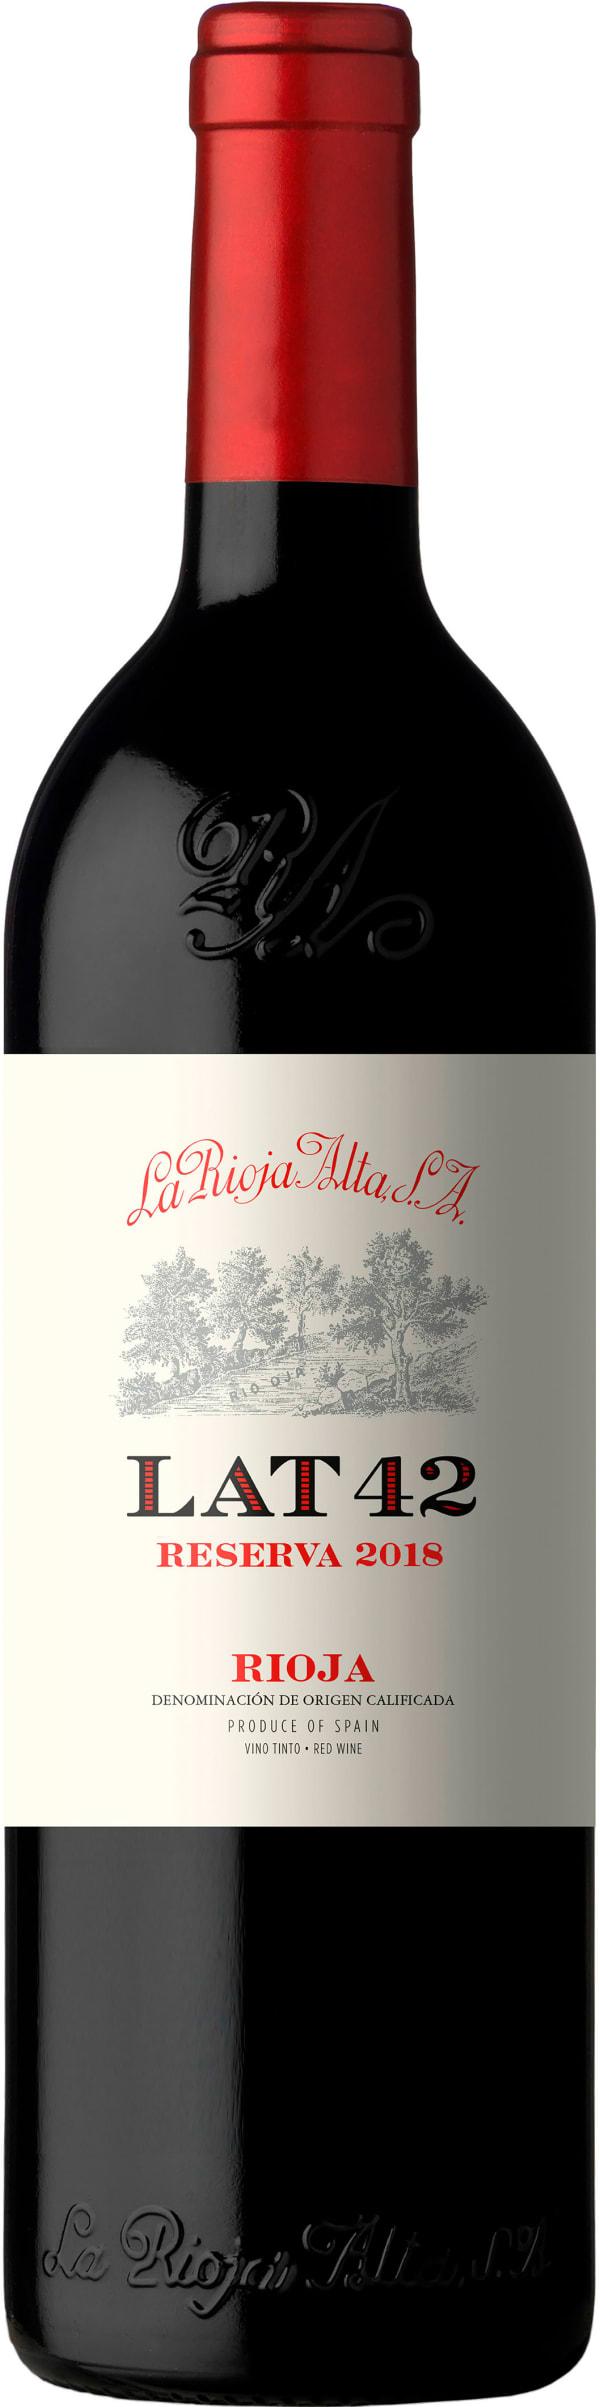 La Rioja Alta LAT 42 Reserva 2015